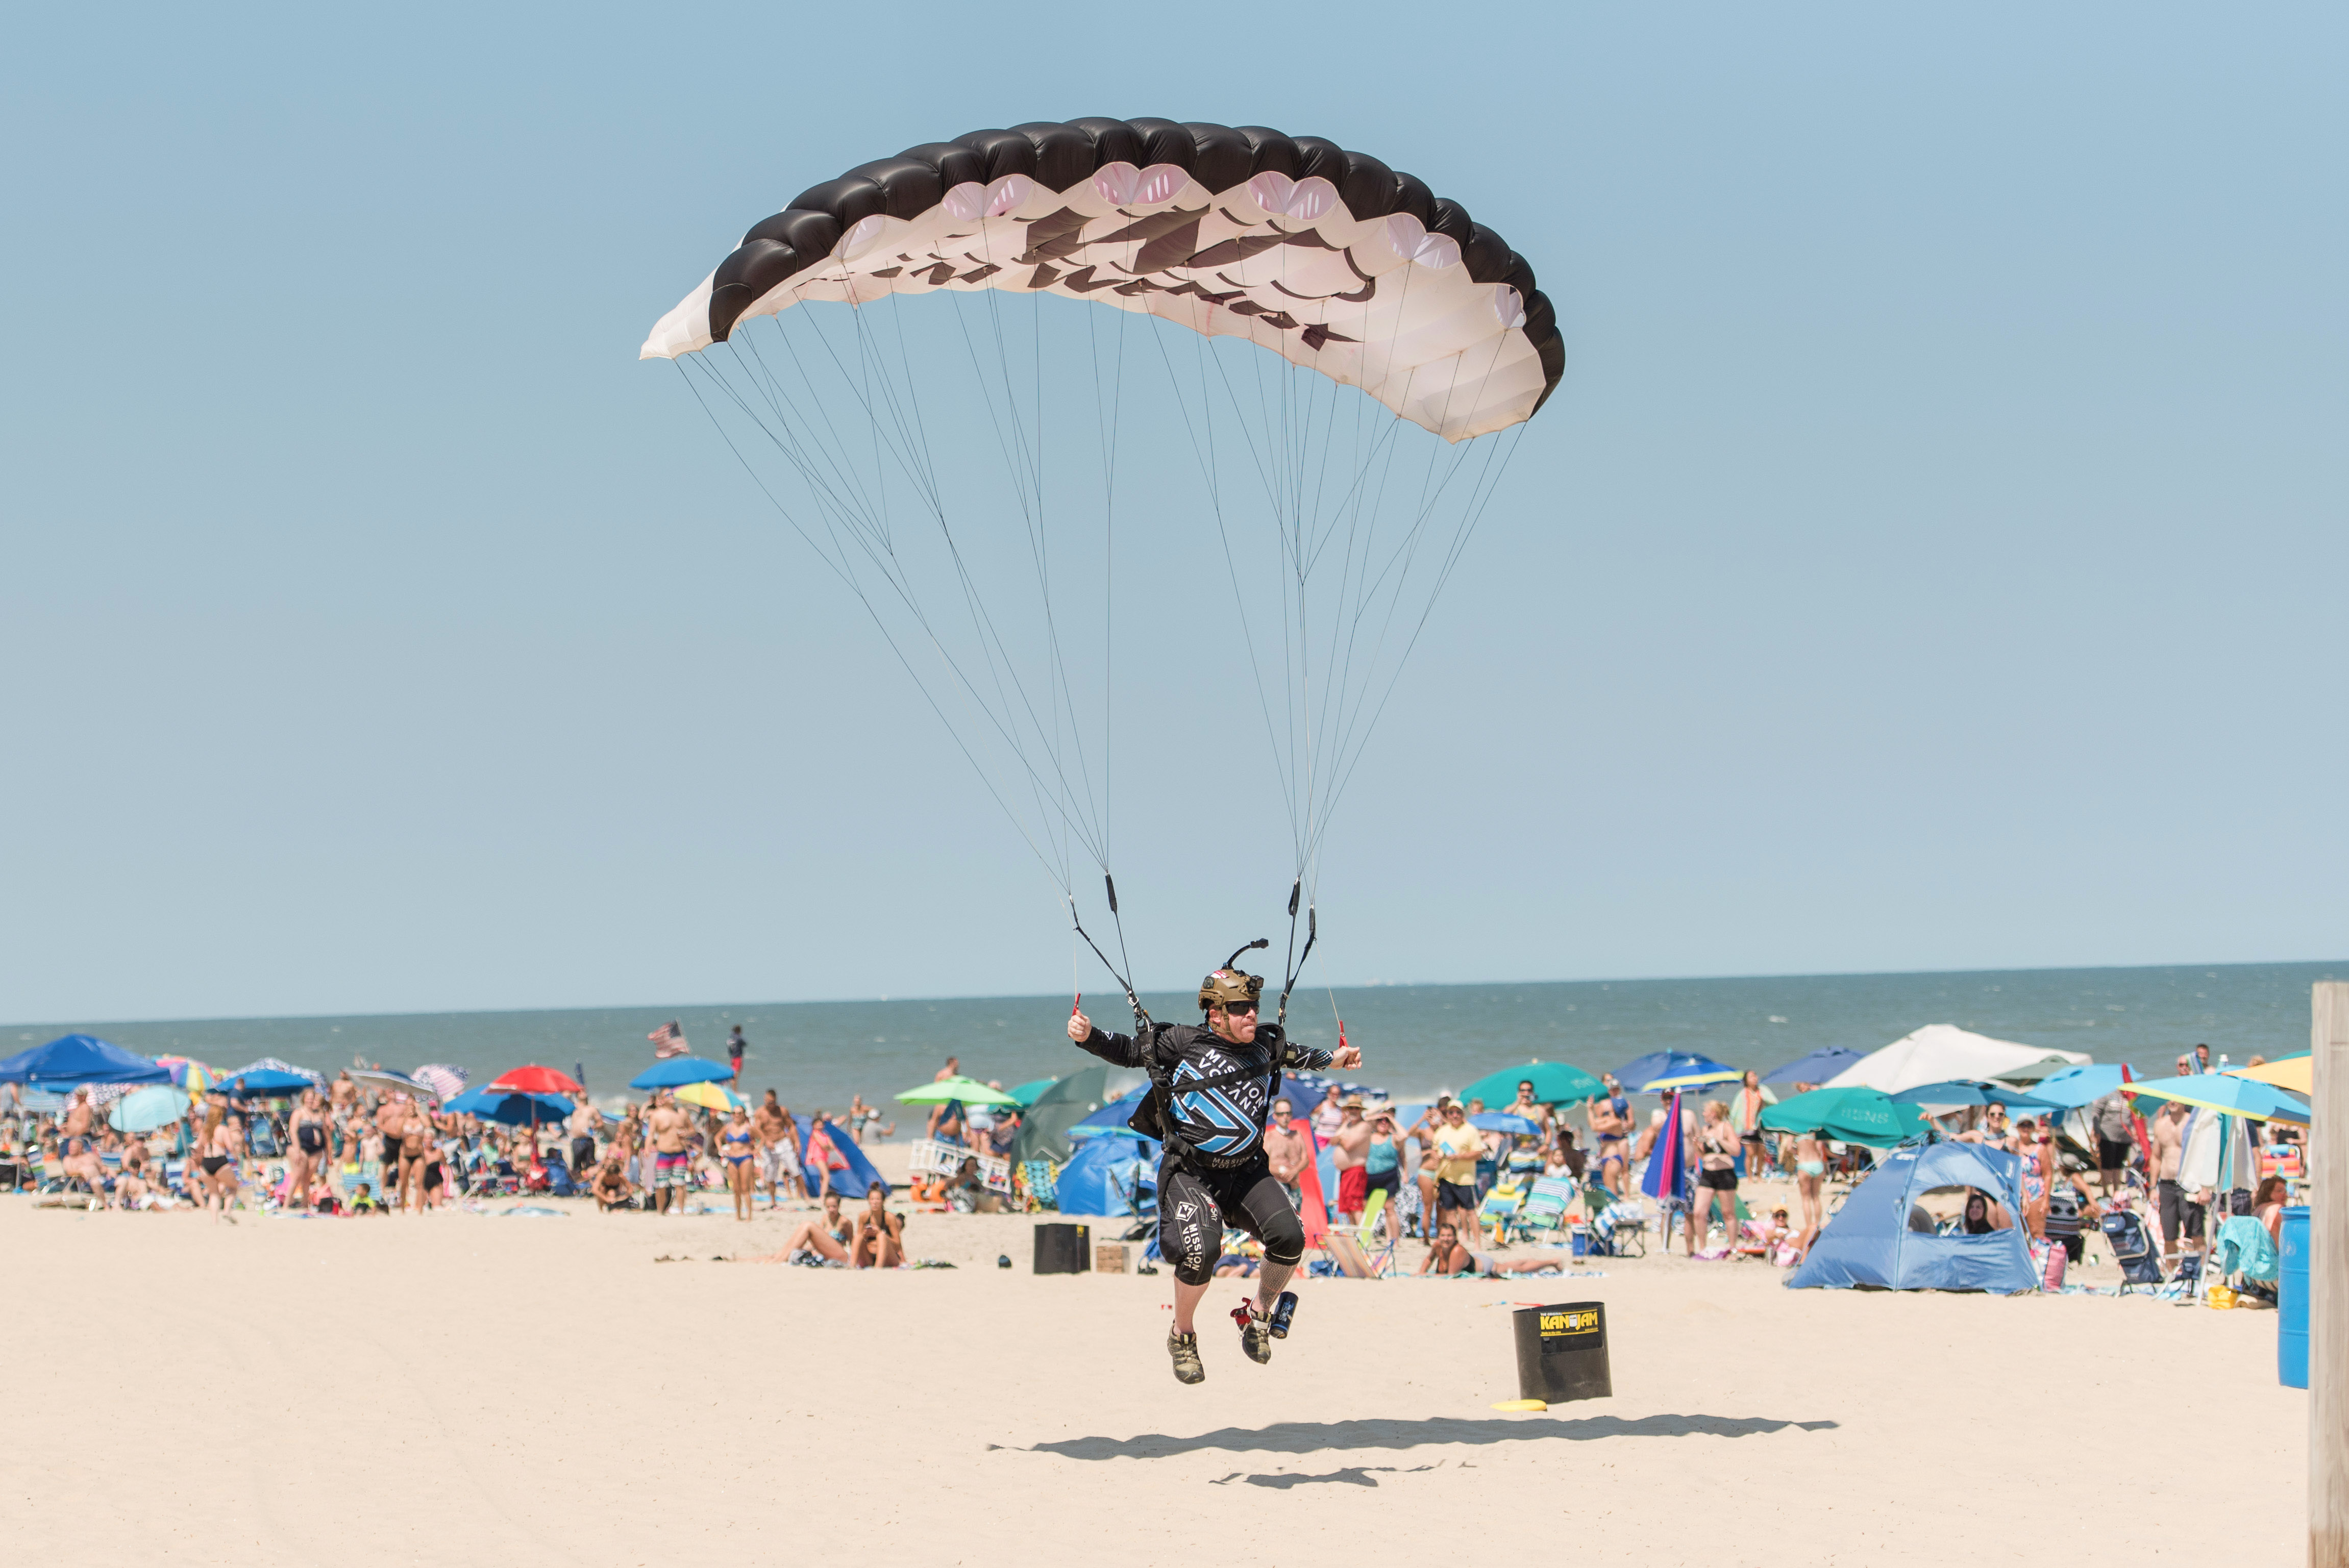 skydiver landing at beach